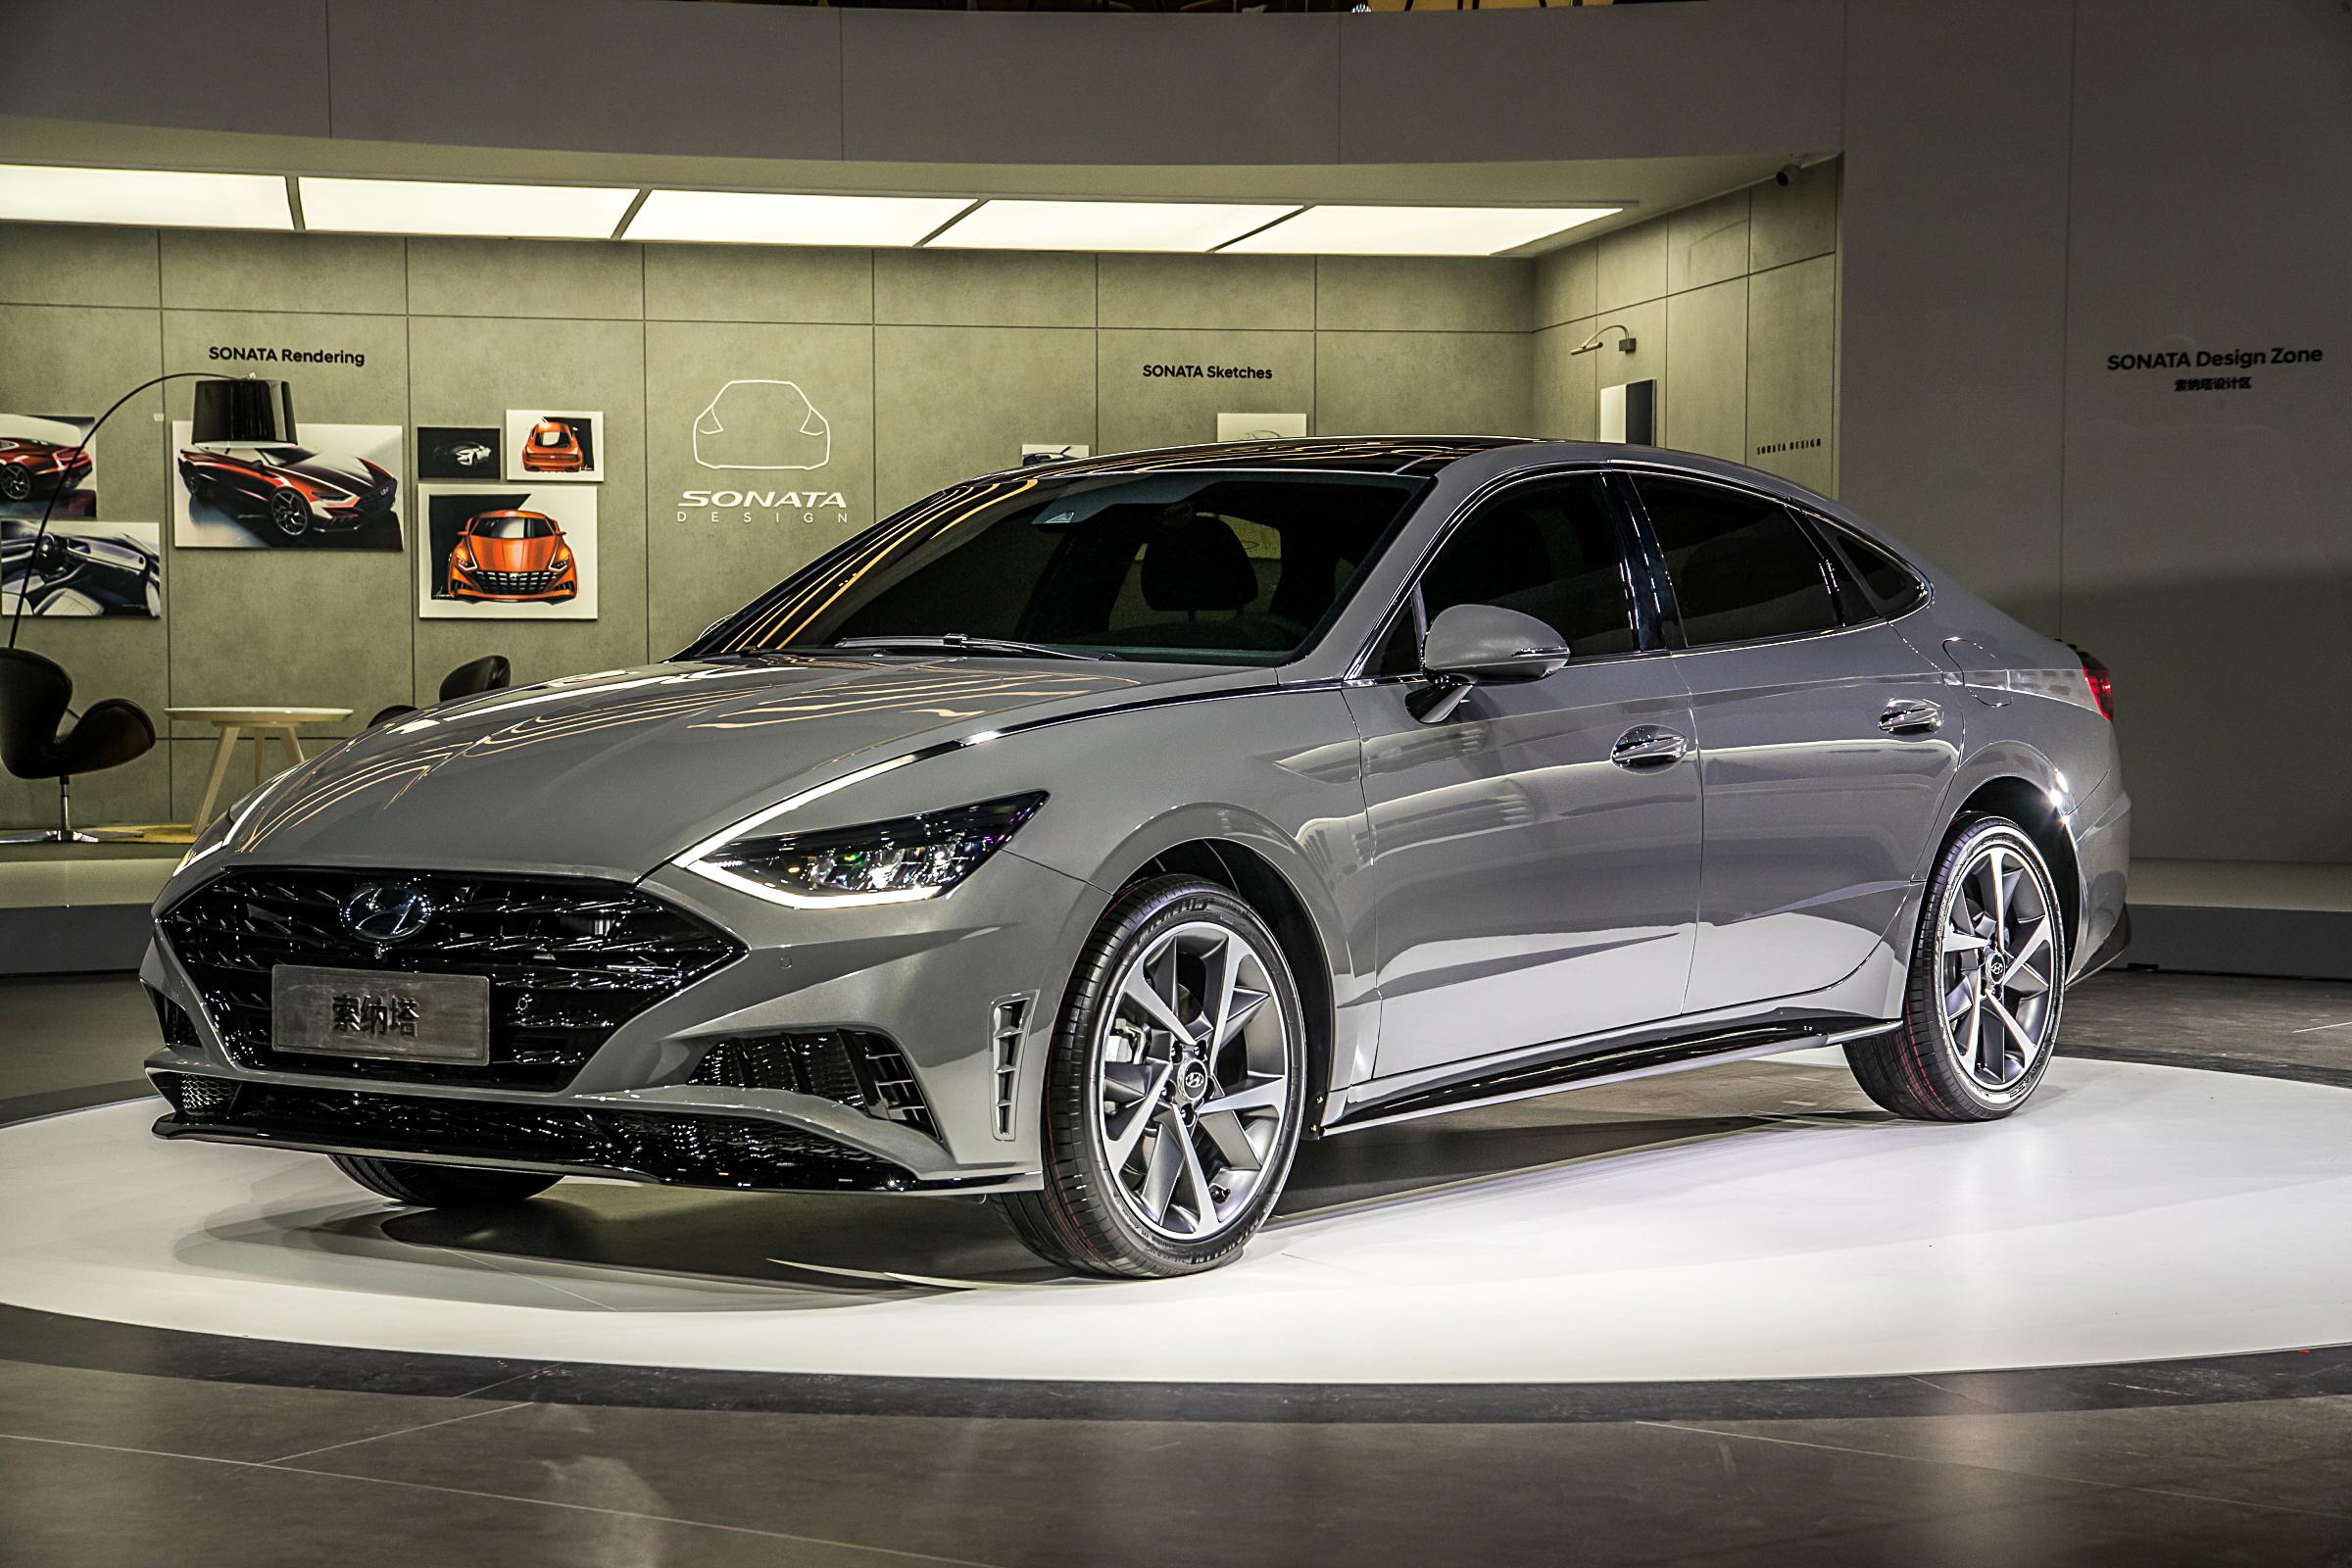 Hyundai Motor Premieres China Focused All New Sonata And All New Ix25 At Auto Shanghai 2019